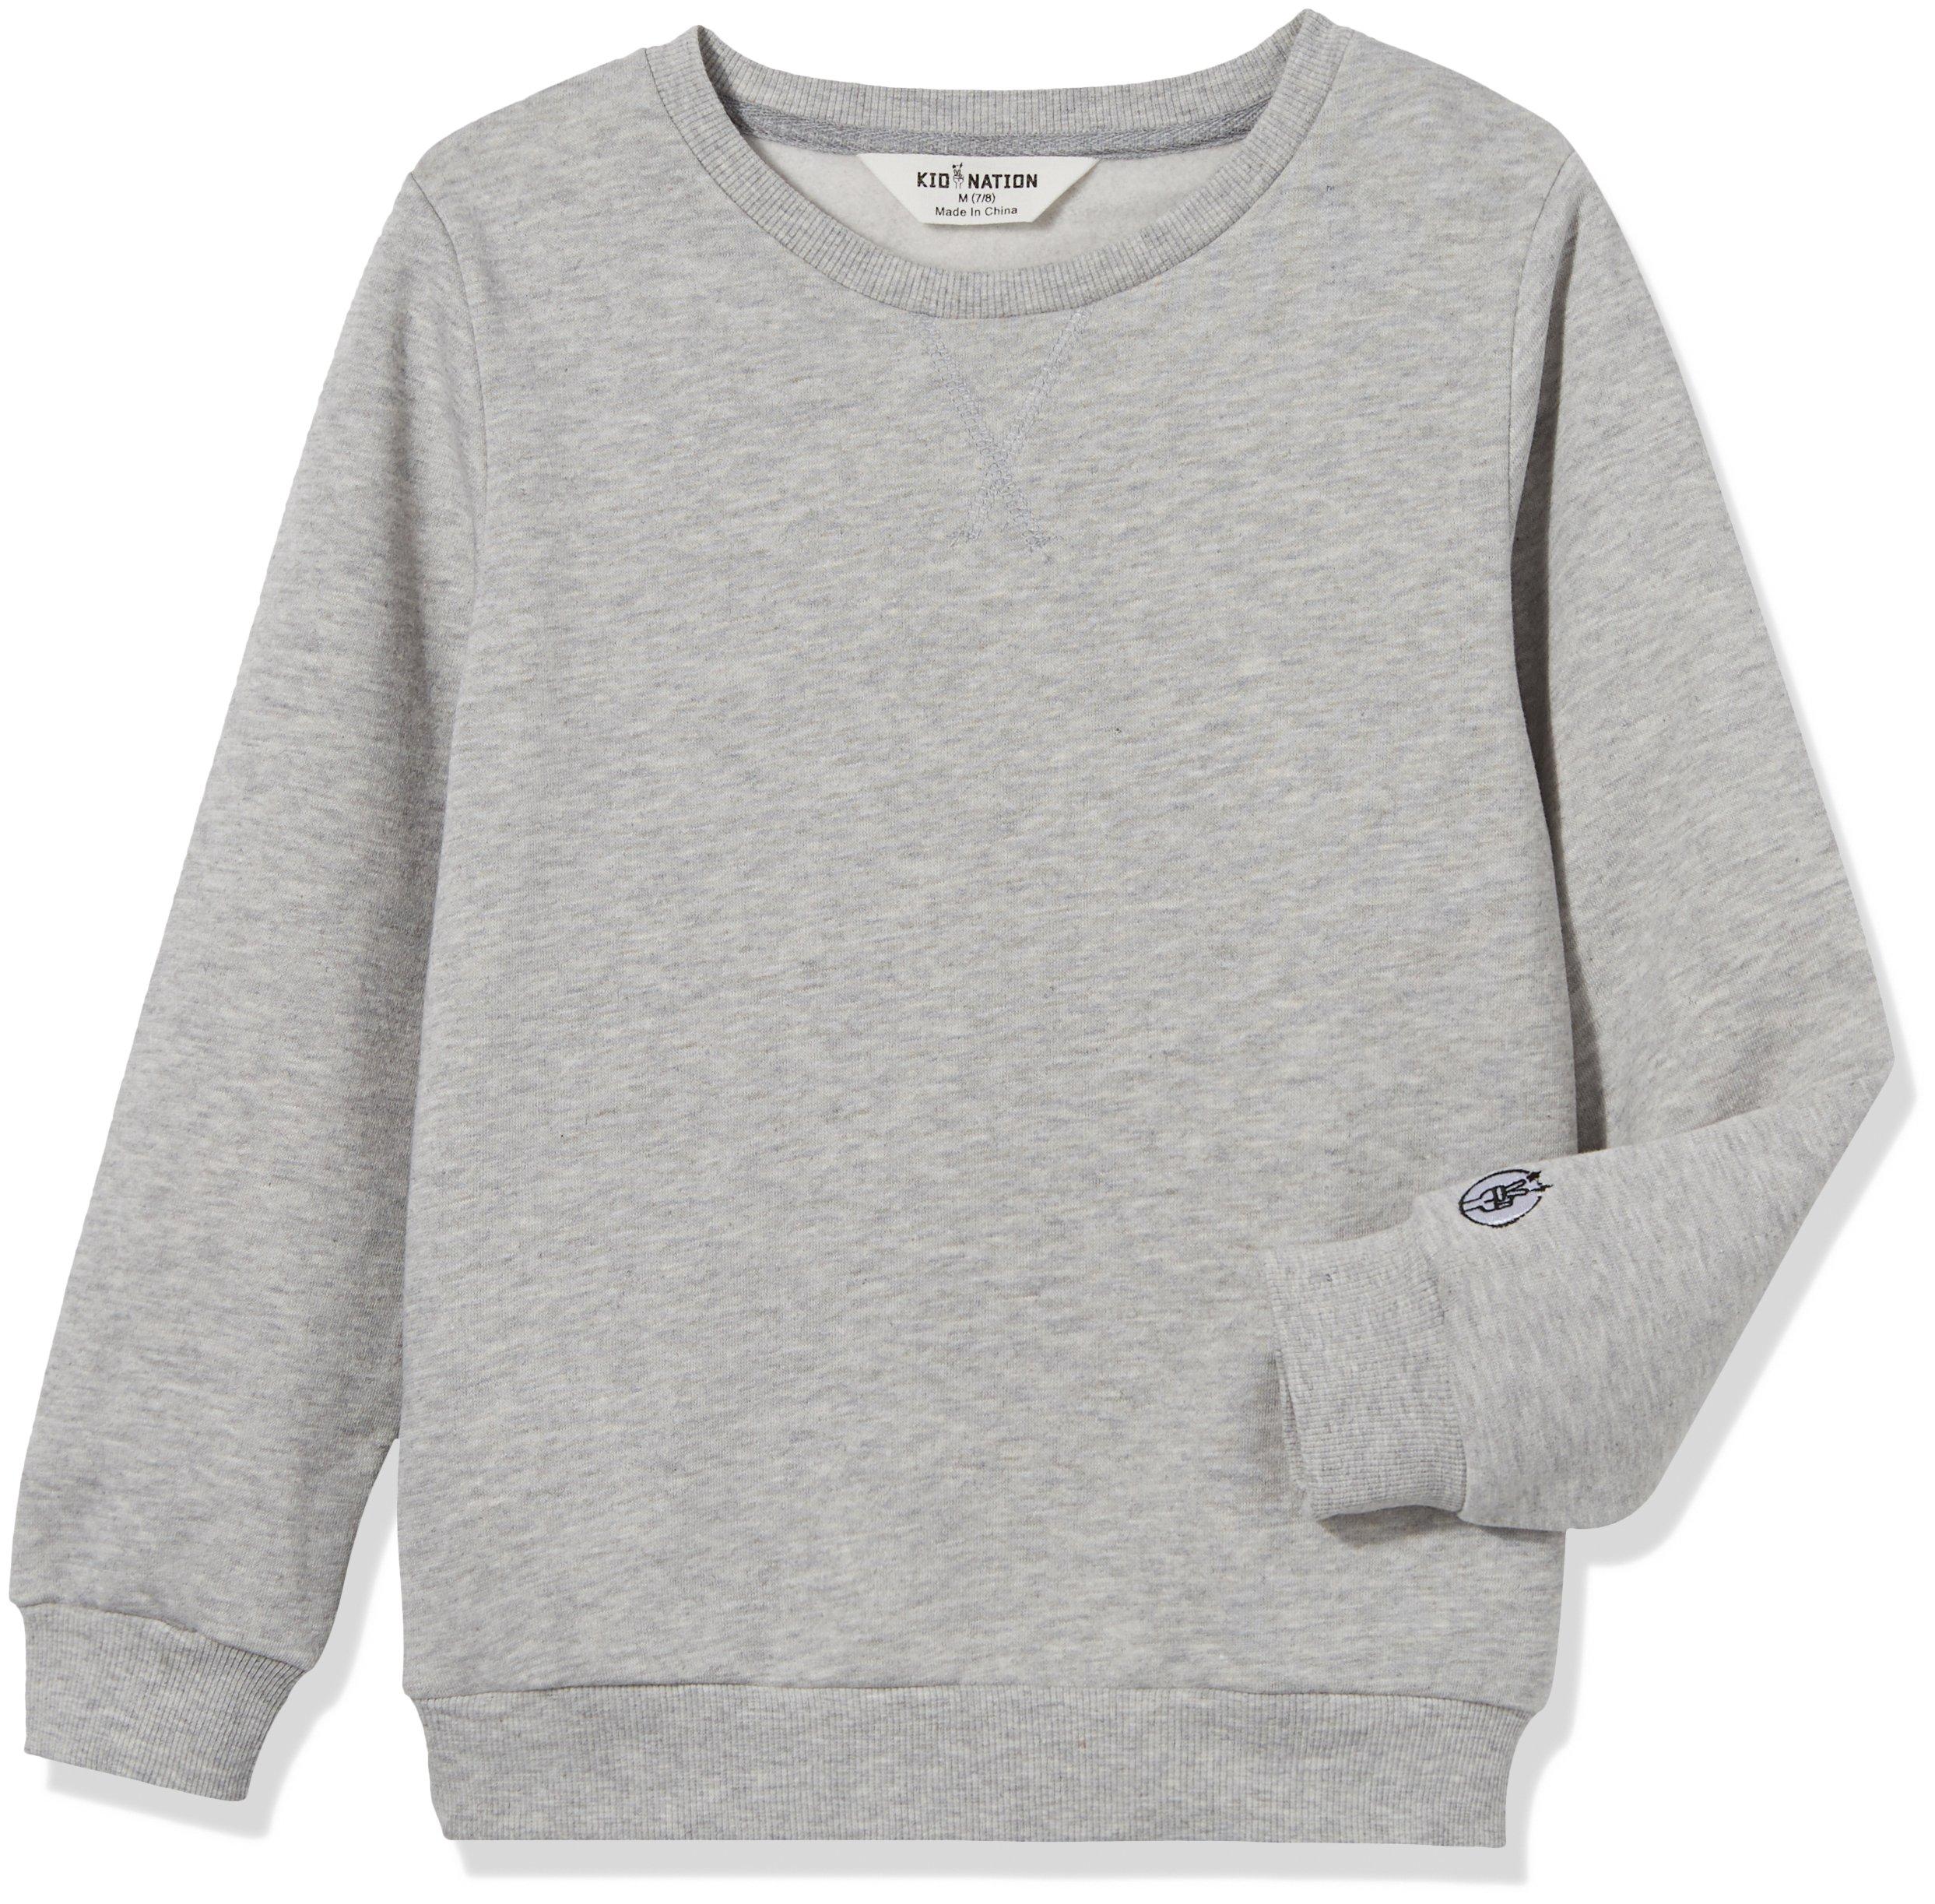 Kid Nation Kids Slouchy Soft Brushed Fleece Casual Basic Crewneck Sweatshirt for Boys or Girls 4-12 Years